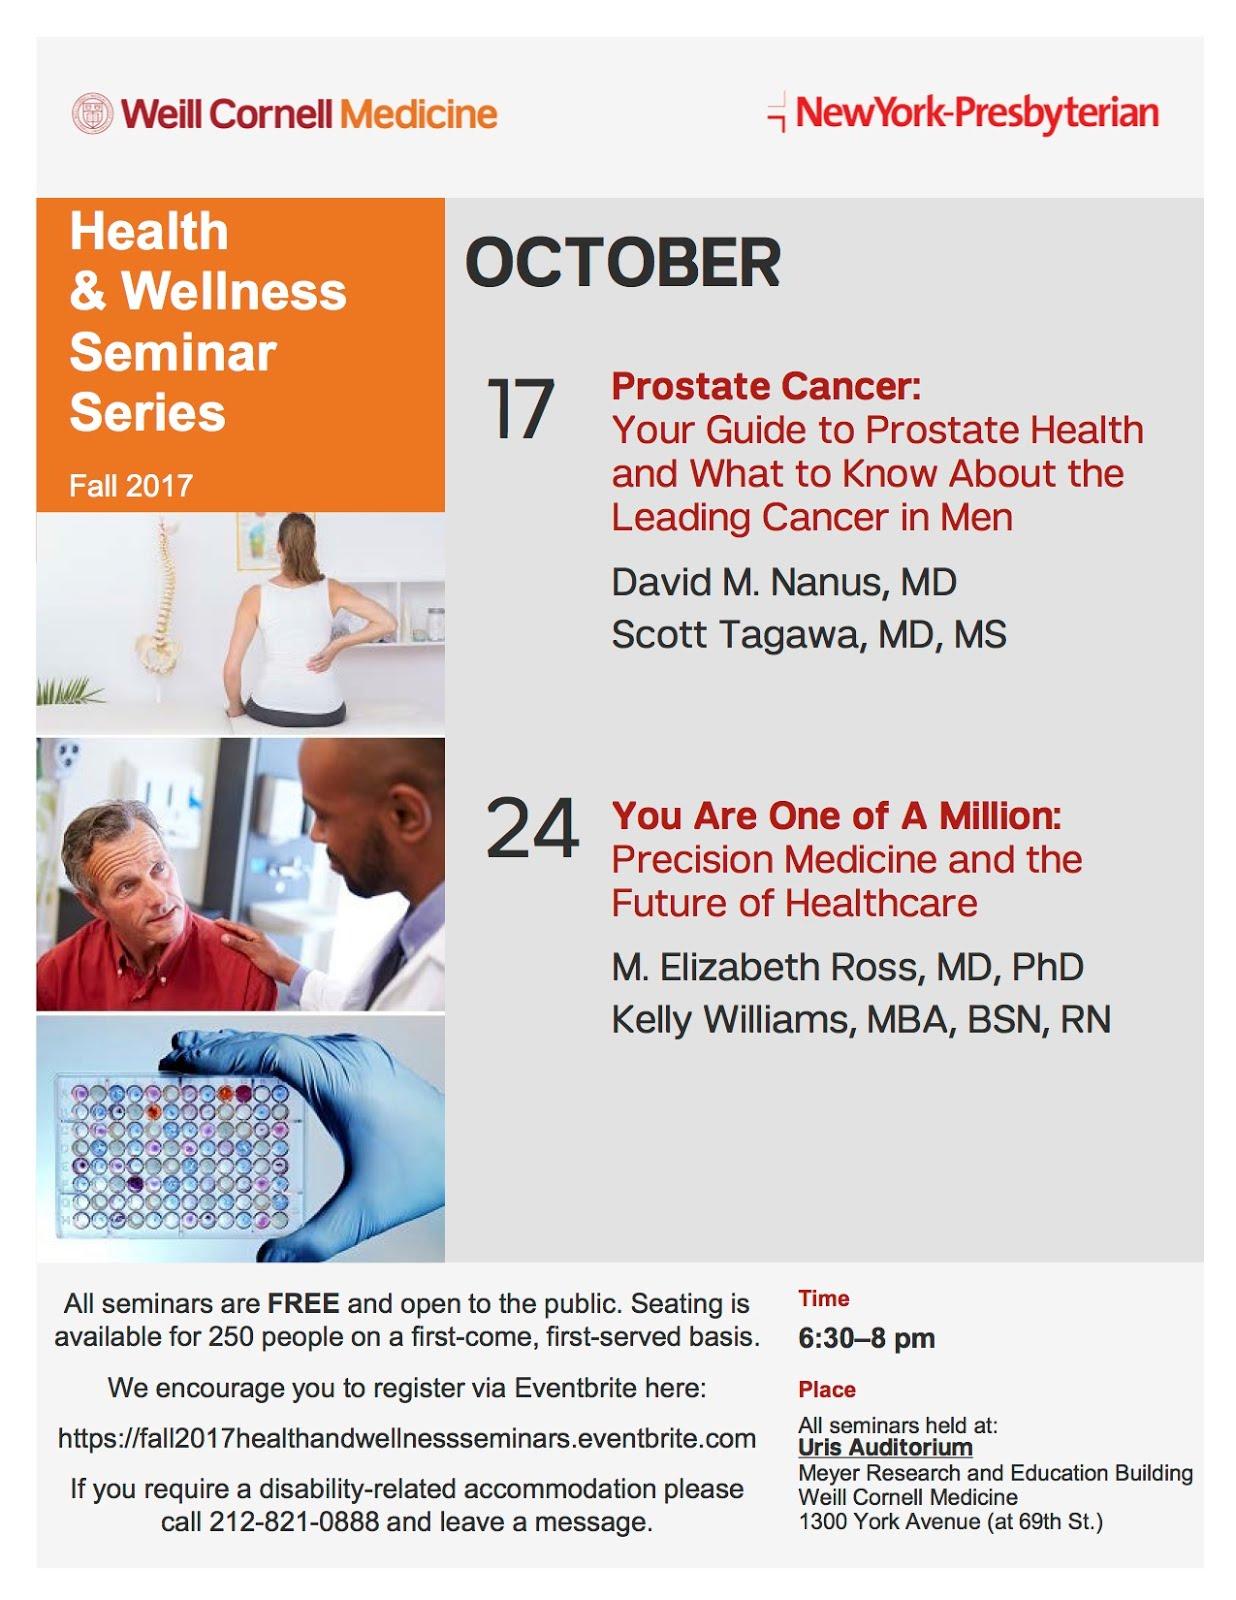 Weill Cornell Medicine/NY Presbyterian Free Health & Wellness Seminars